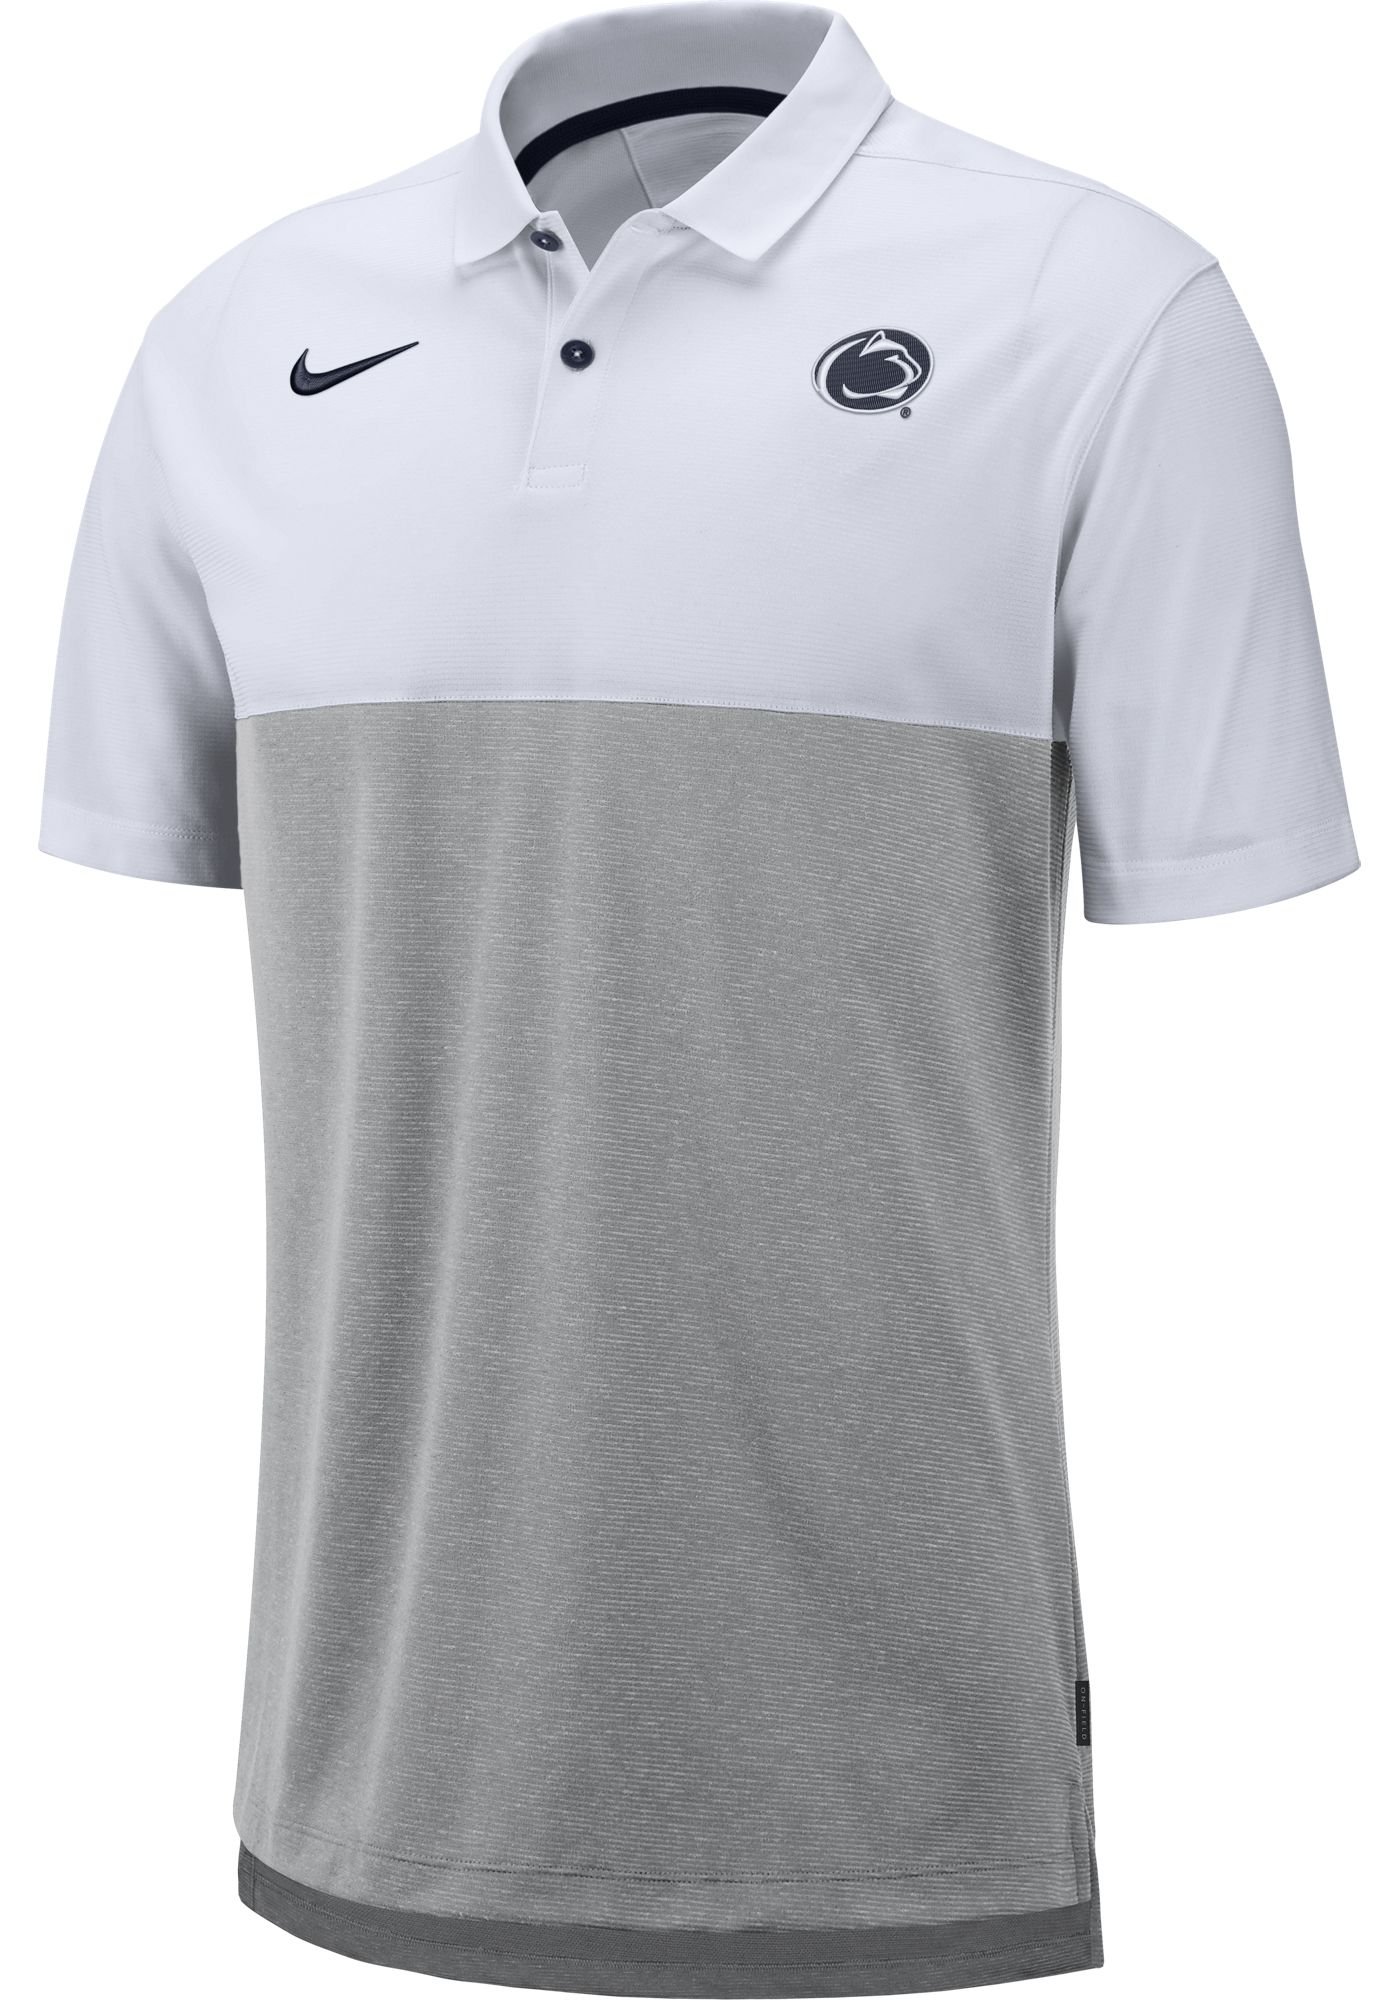 Nike Men's Penn State Nittany Lions White/Grey Dri-FIT Breathe Football Sideline Polo